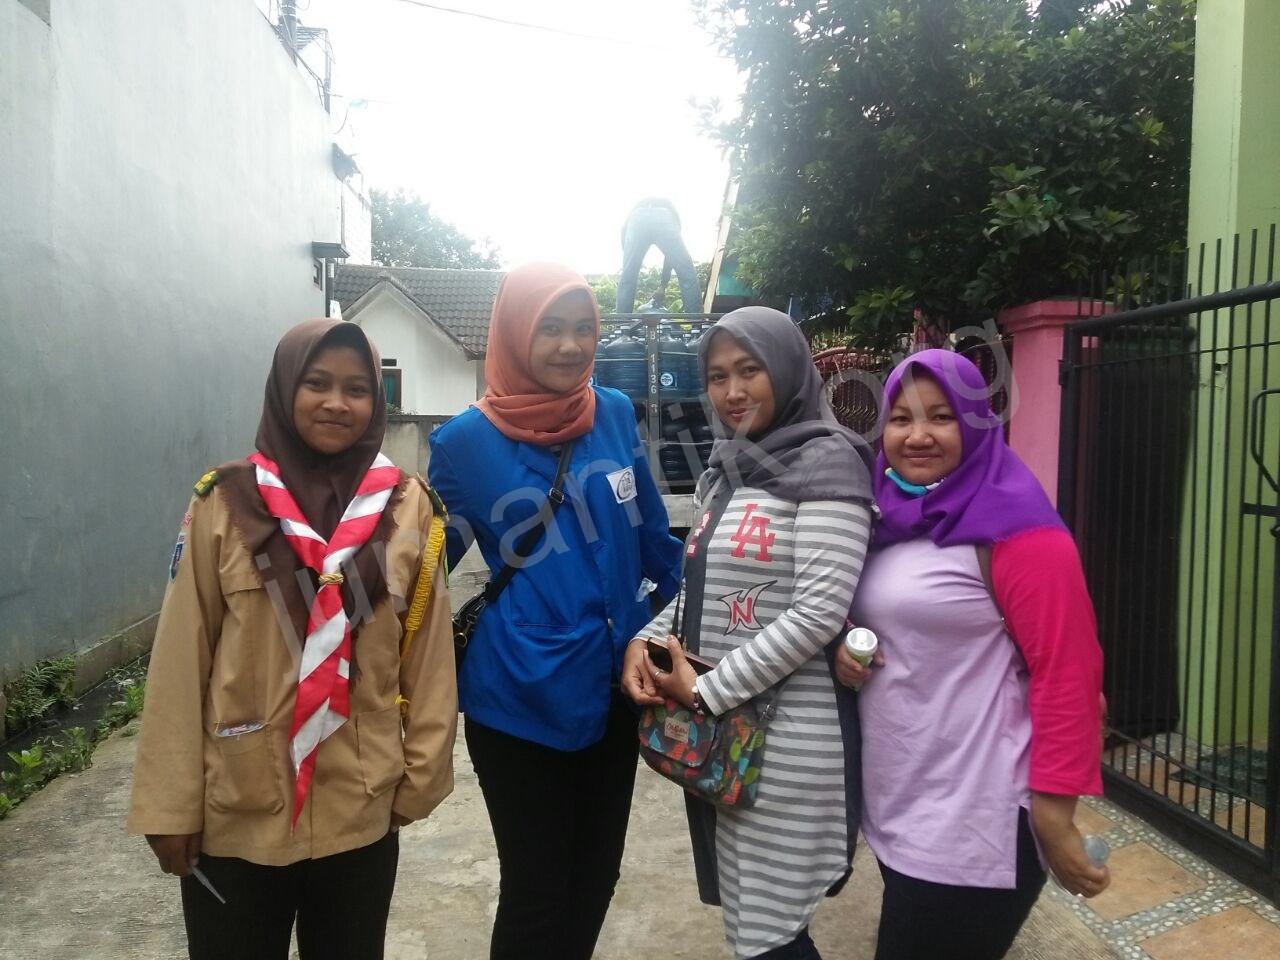 Jumantikers_gerebek_kampung_kelurahan_bambu_apus27.jpg